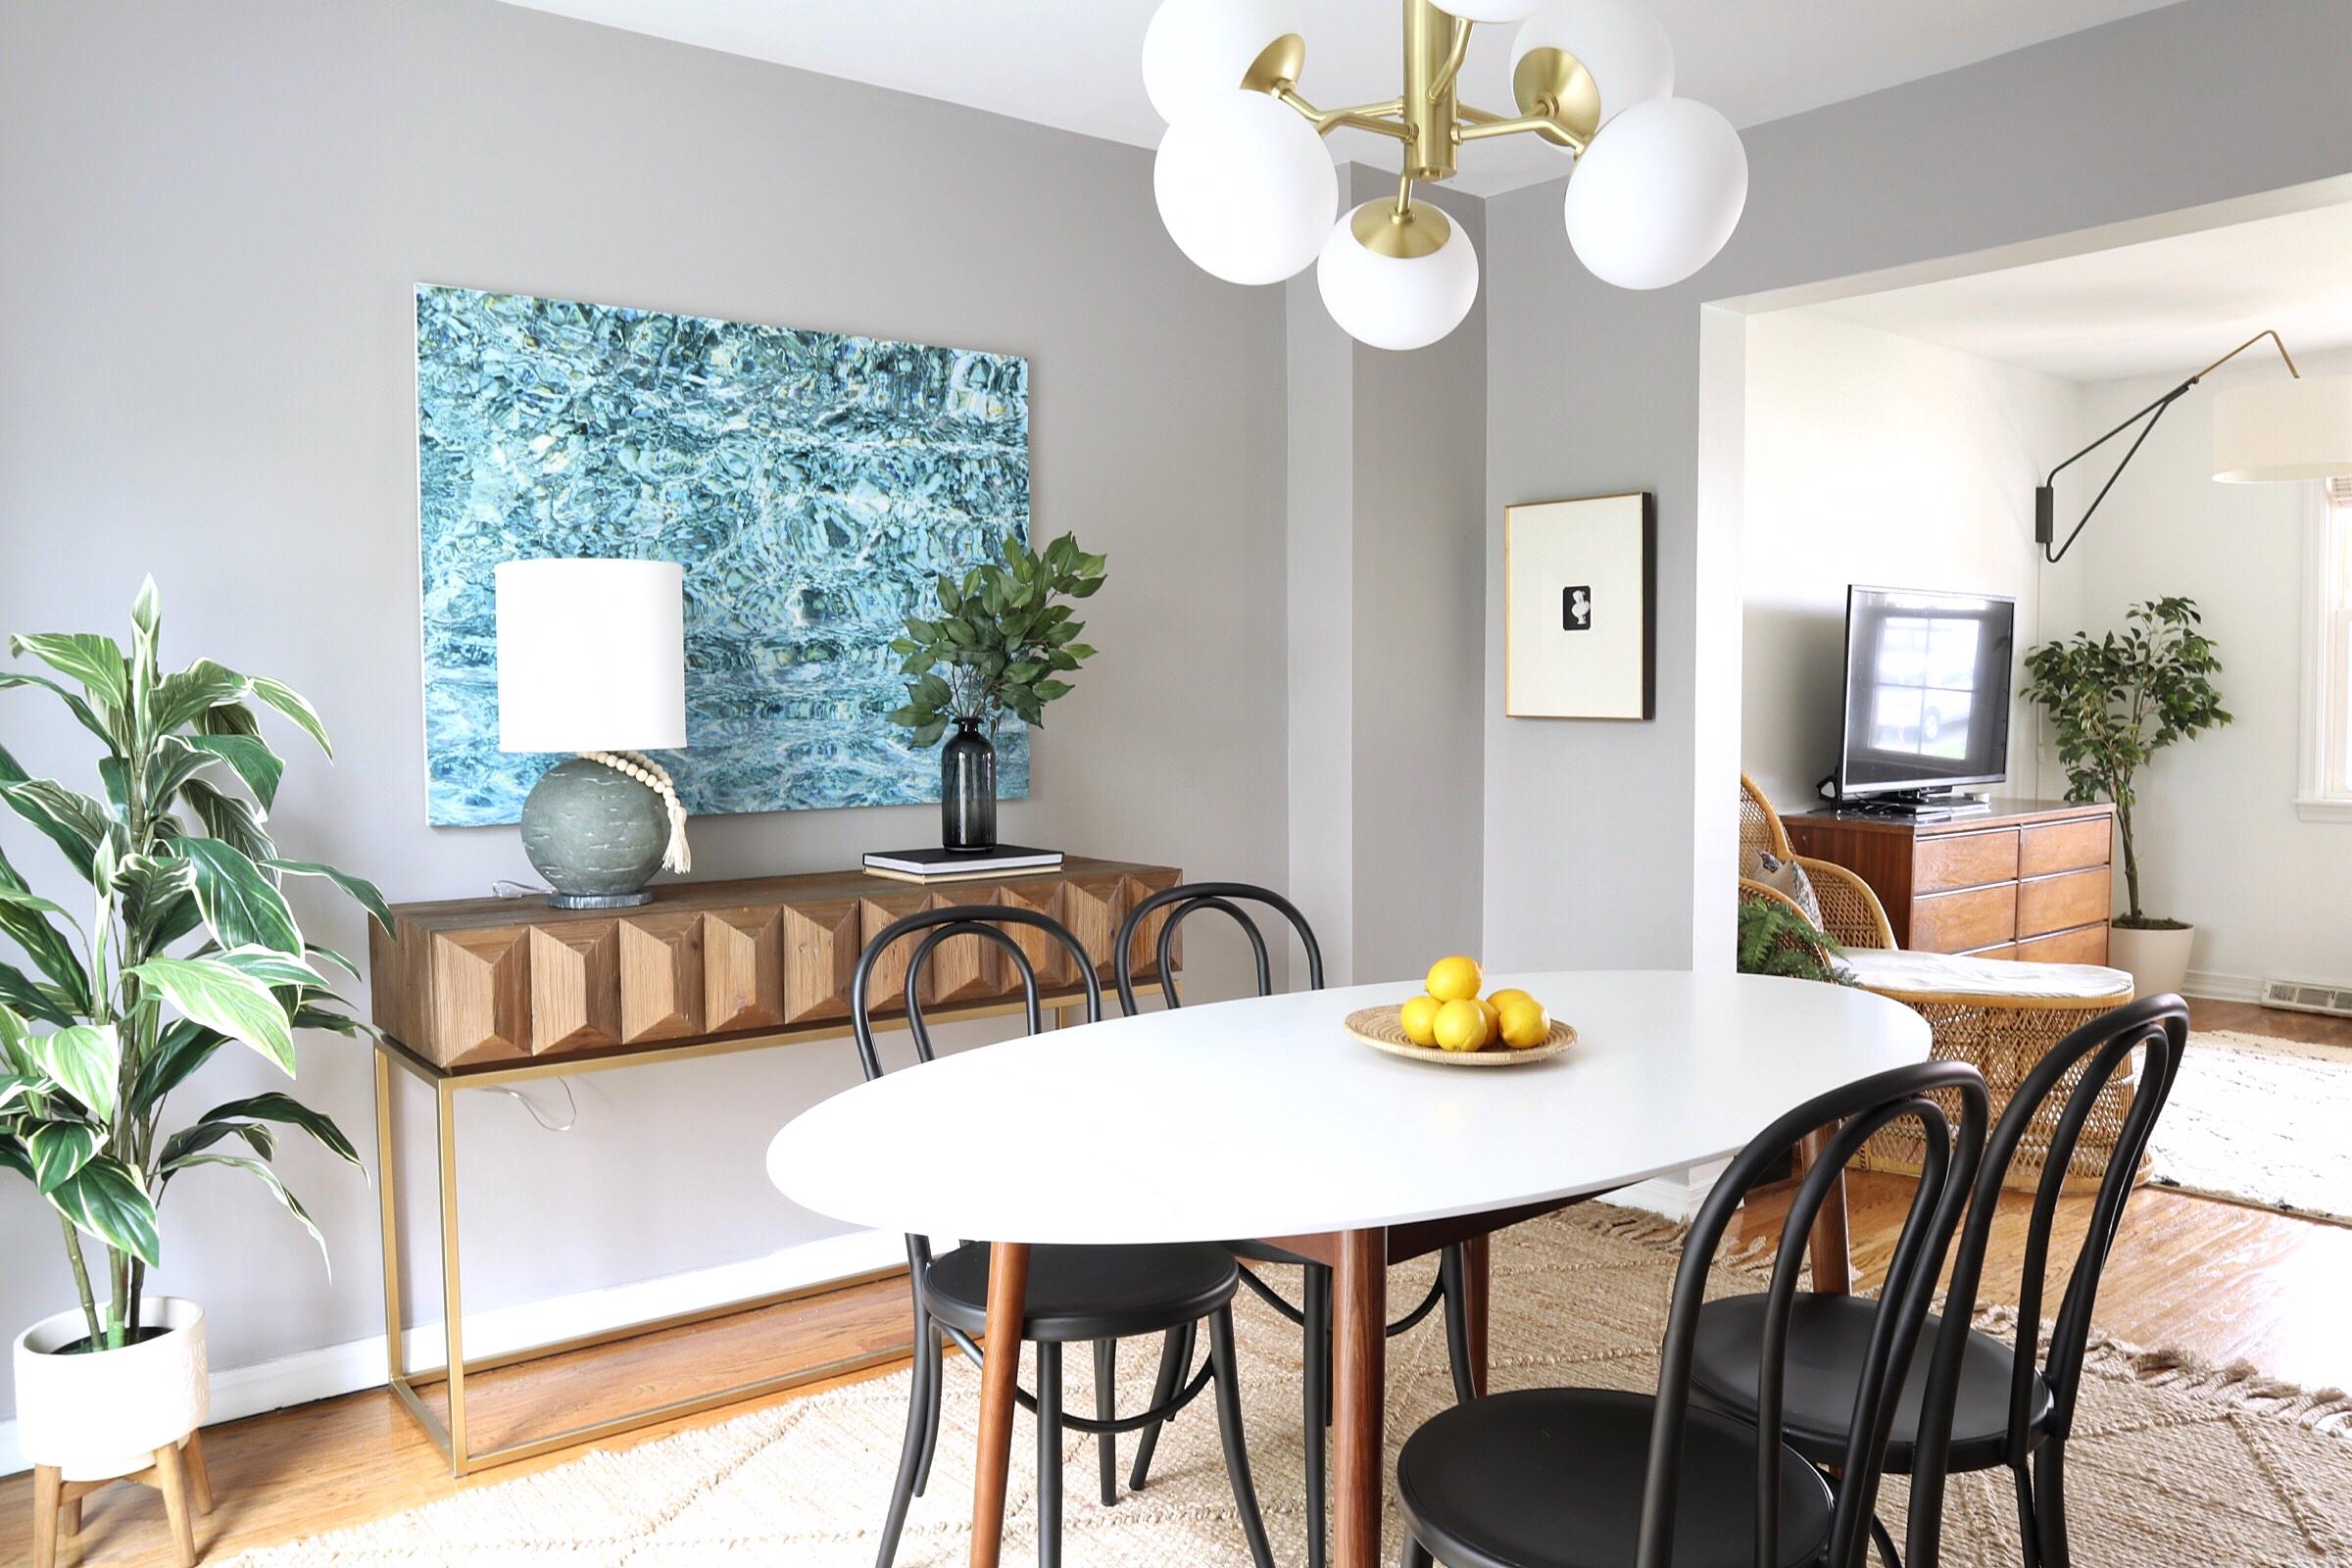 Modern-Boho-Dining-Room-02.jpg